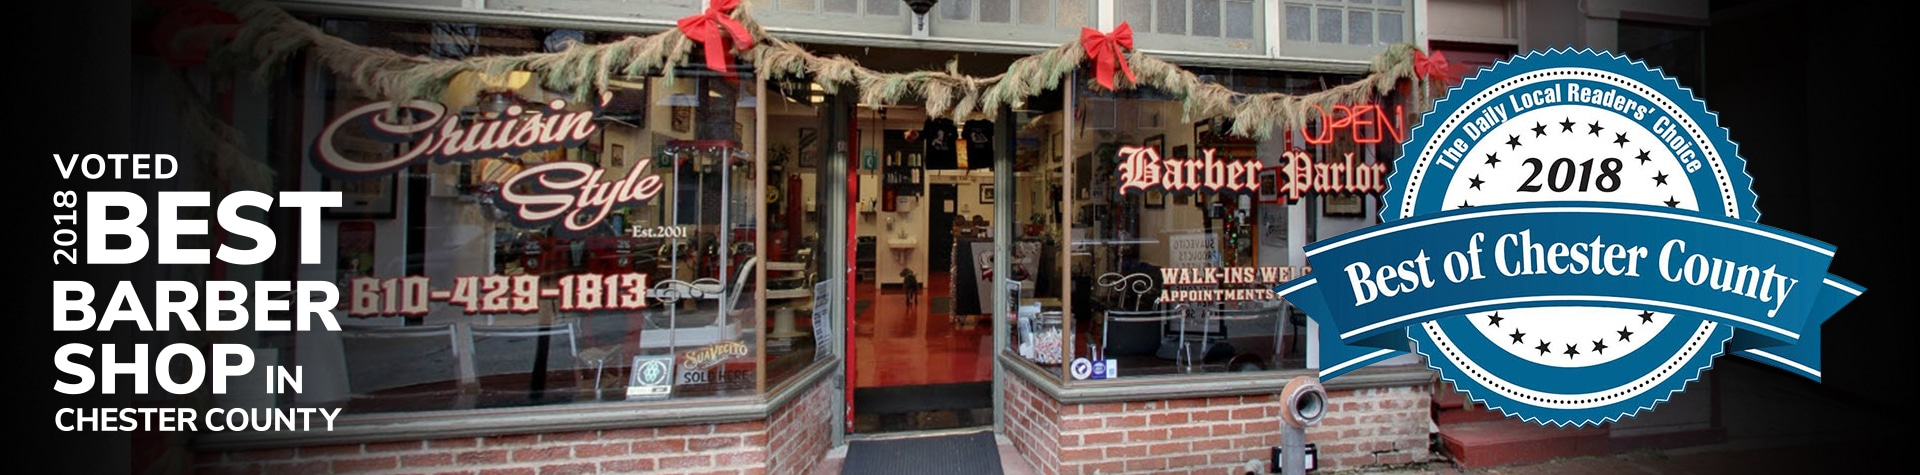 Cruisin Stytle Barber Shop Readers Choice Award